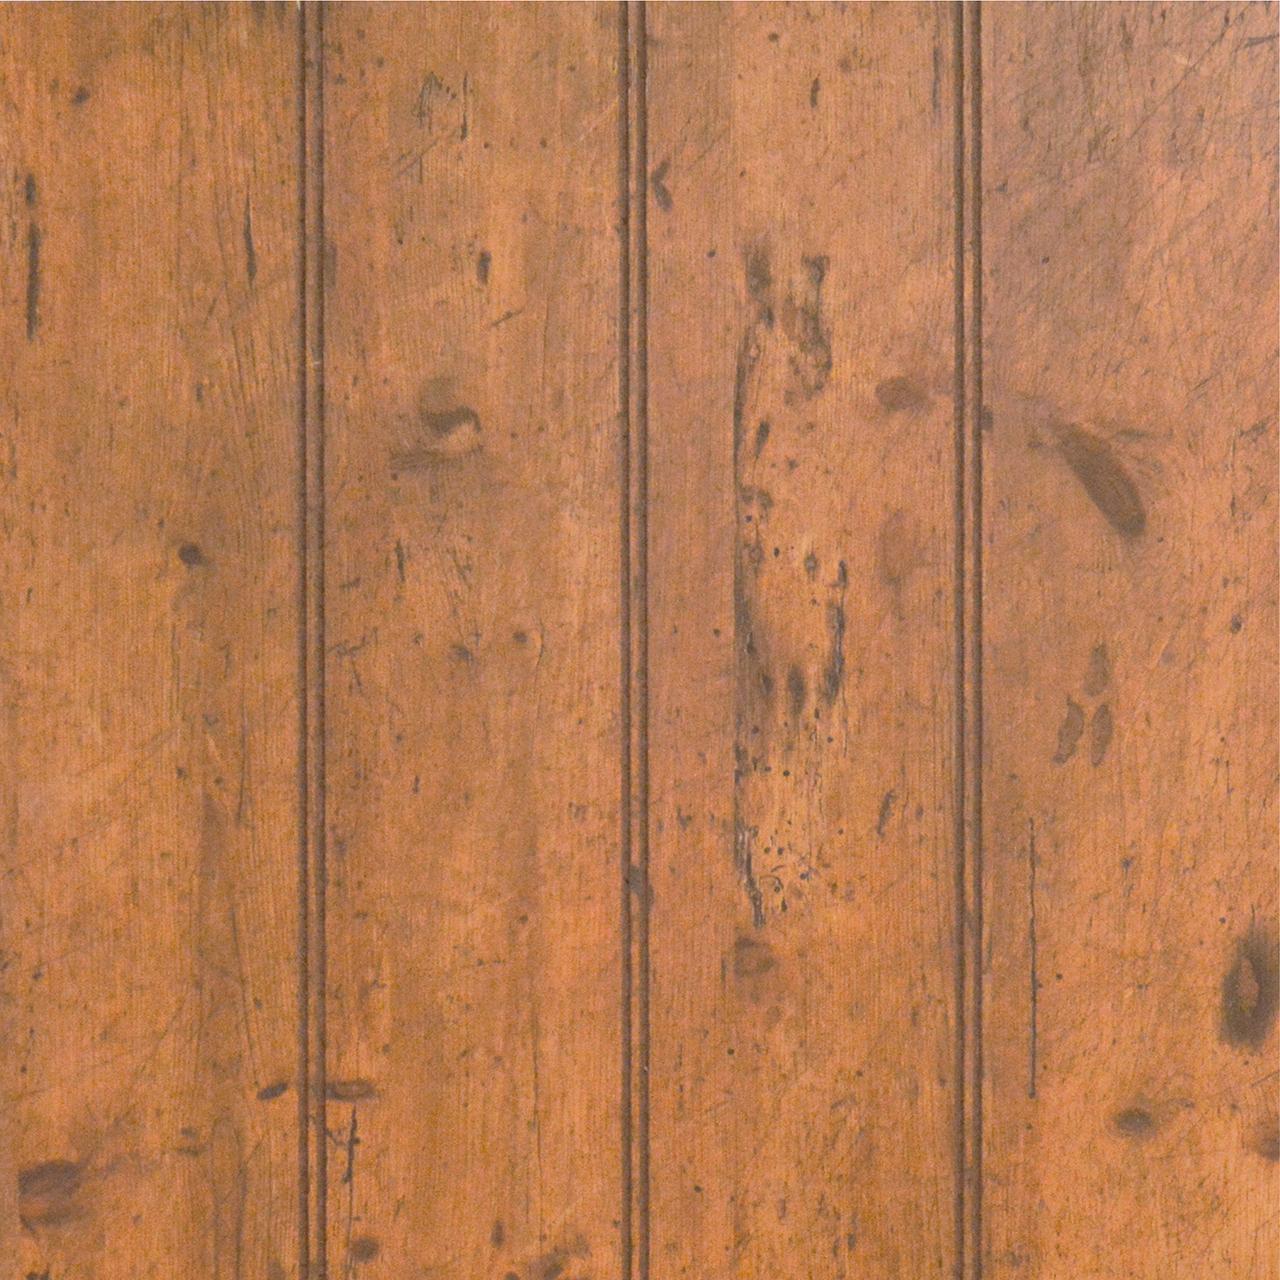 Wood Paneling Rustic Wine Cellar Oak Beadboard